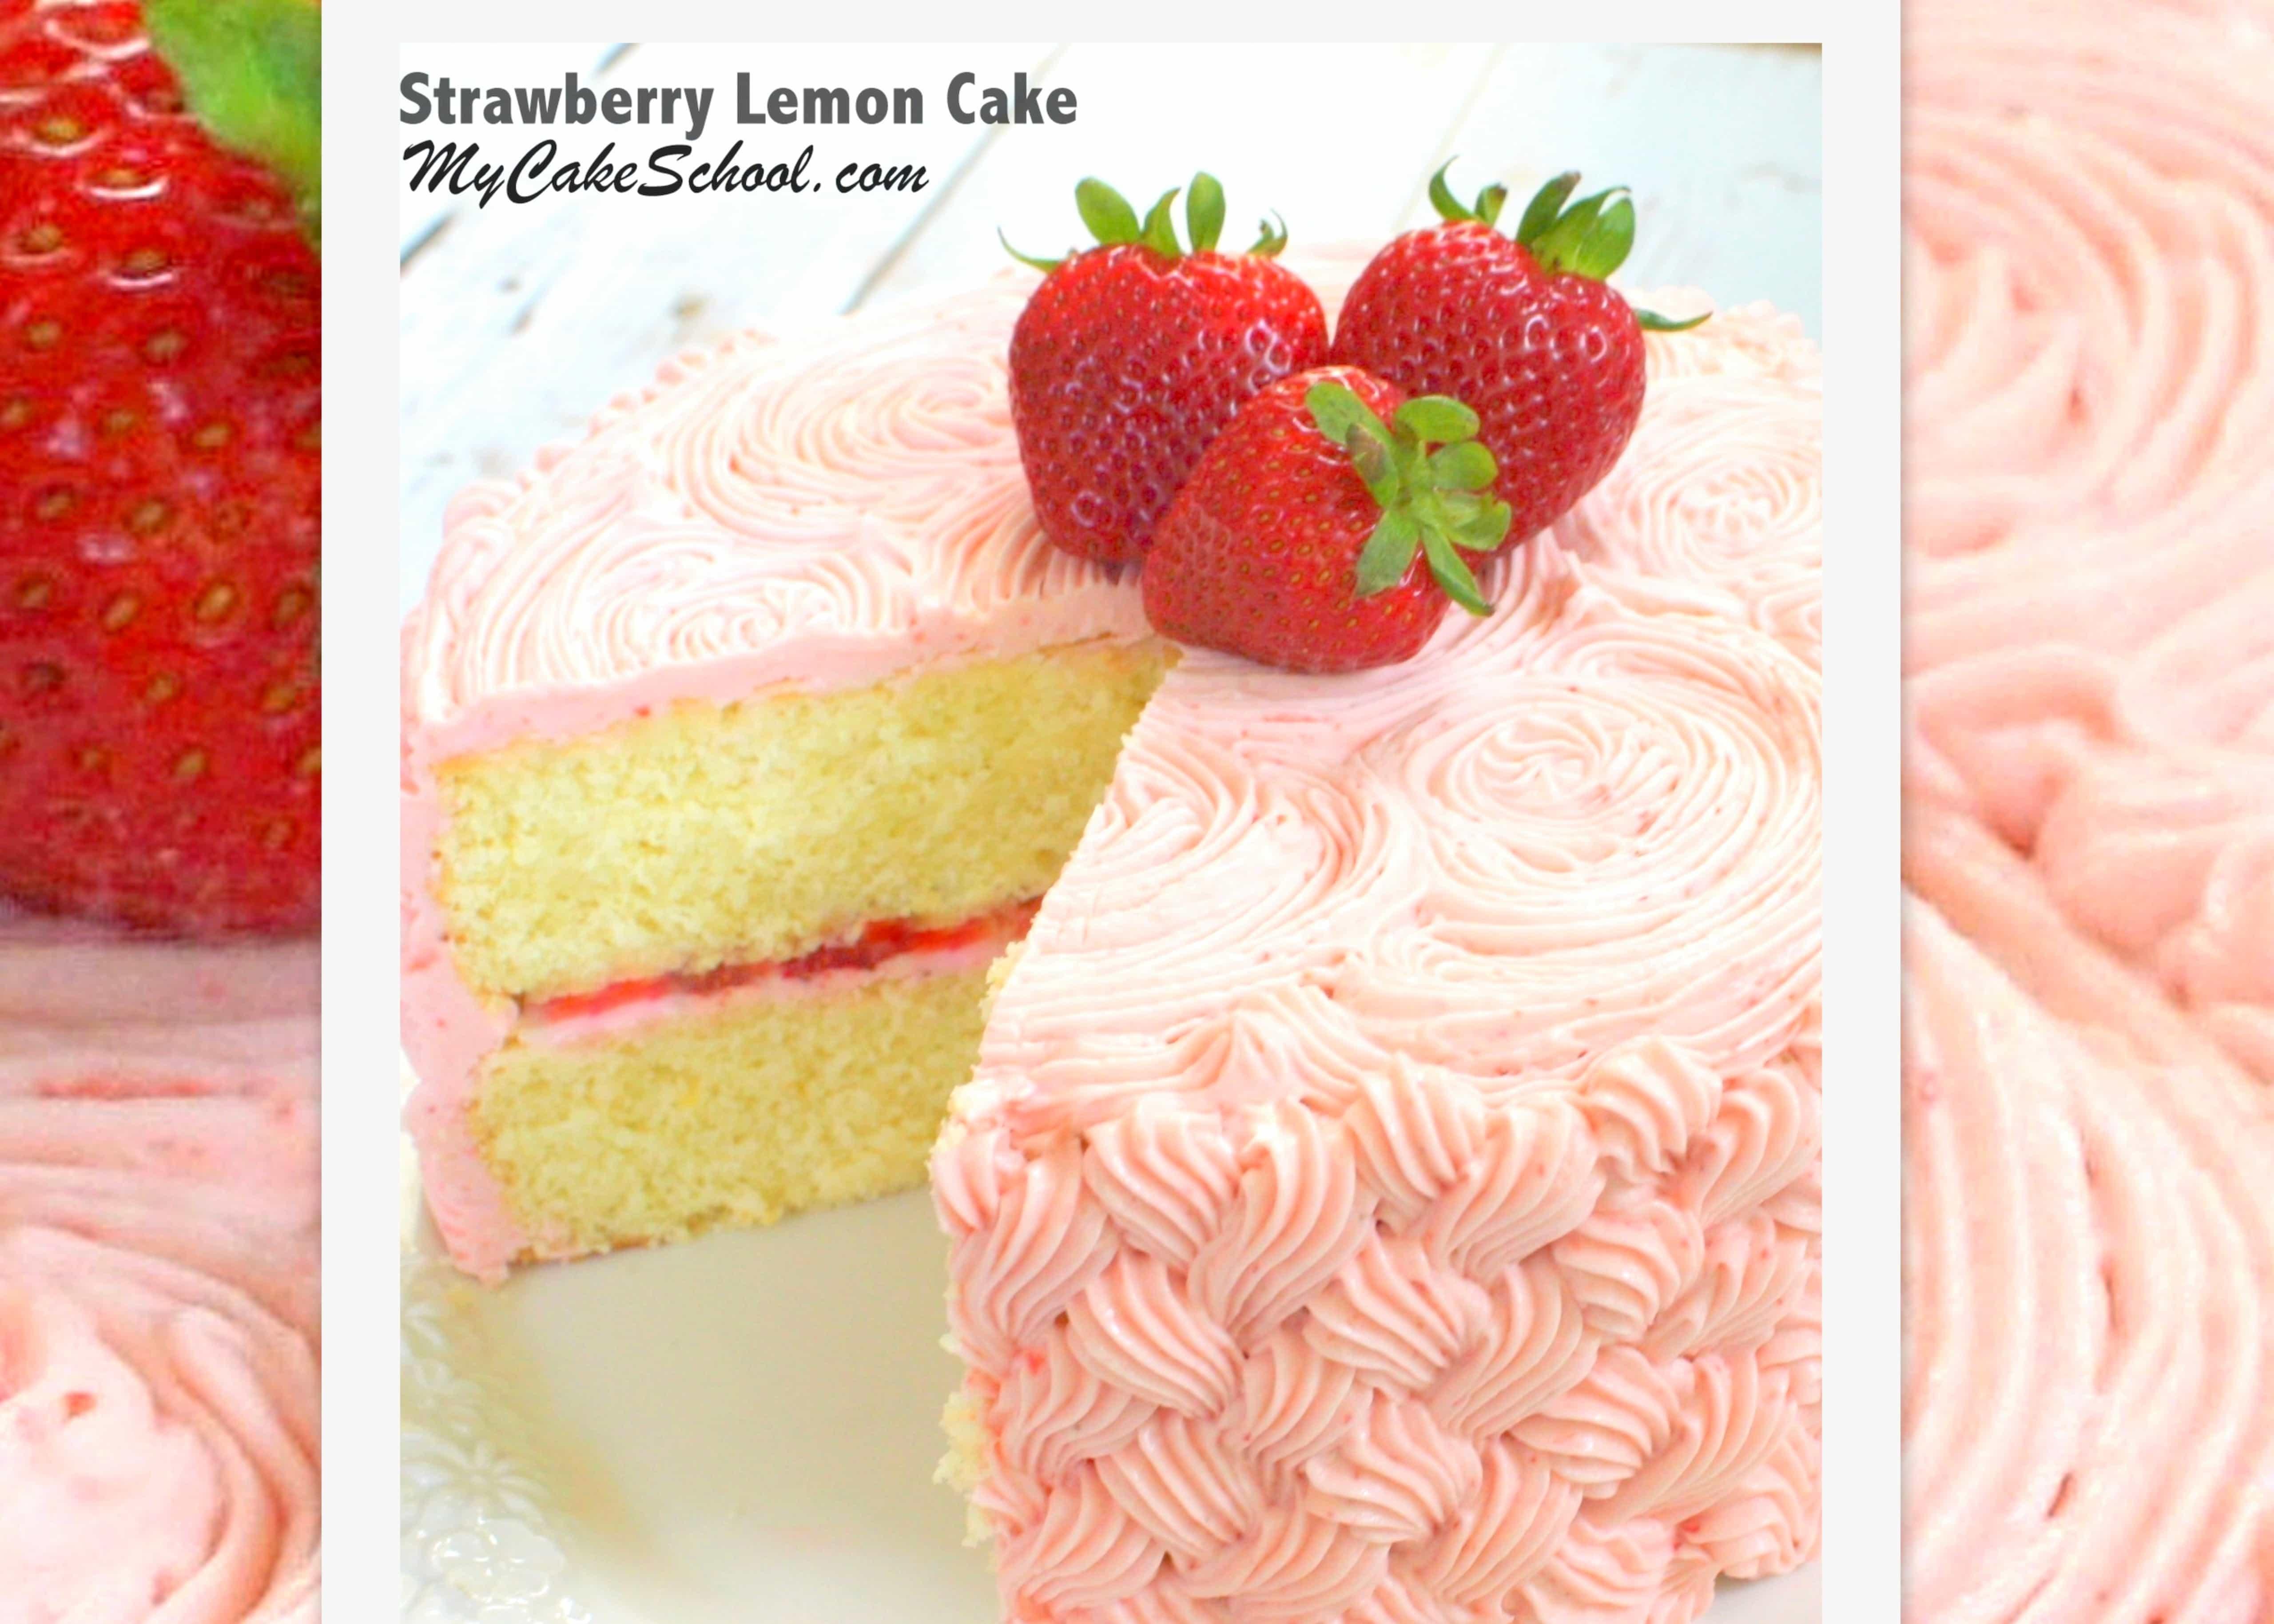 Strawberry Lemon Cake | My Cake School